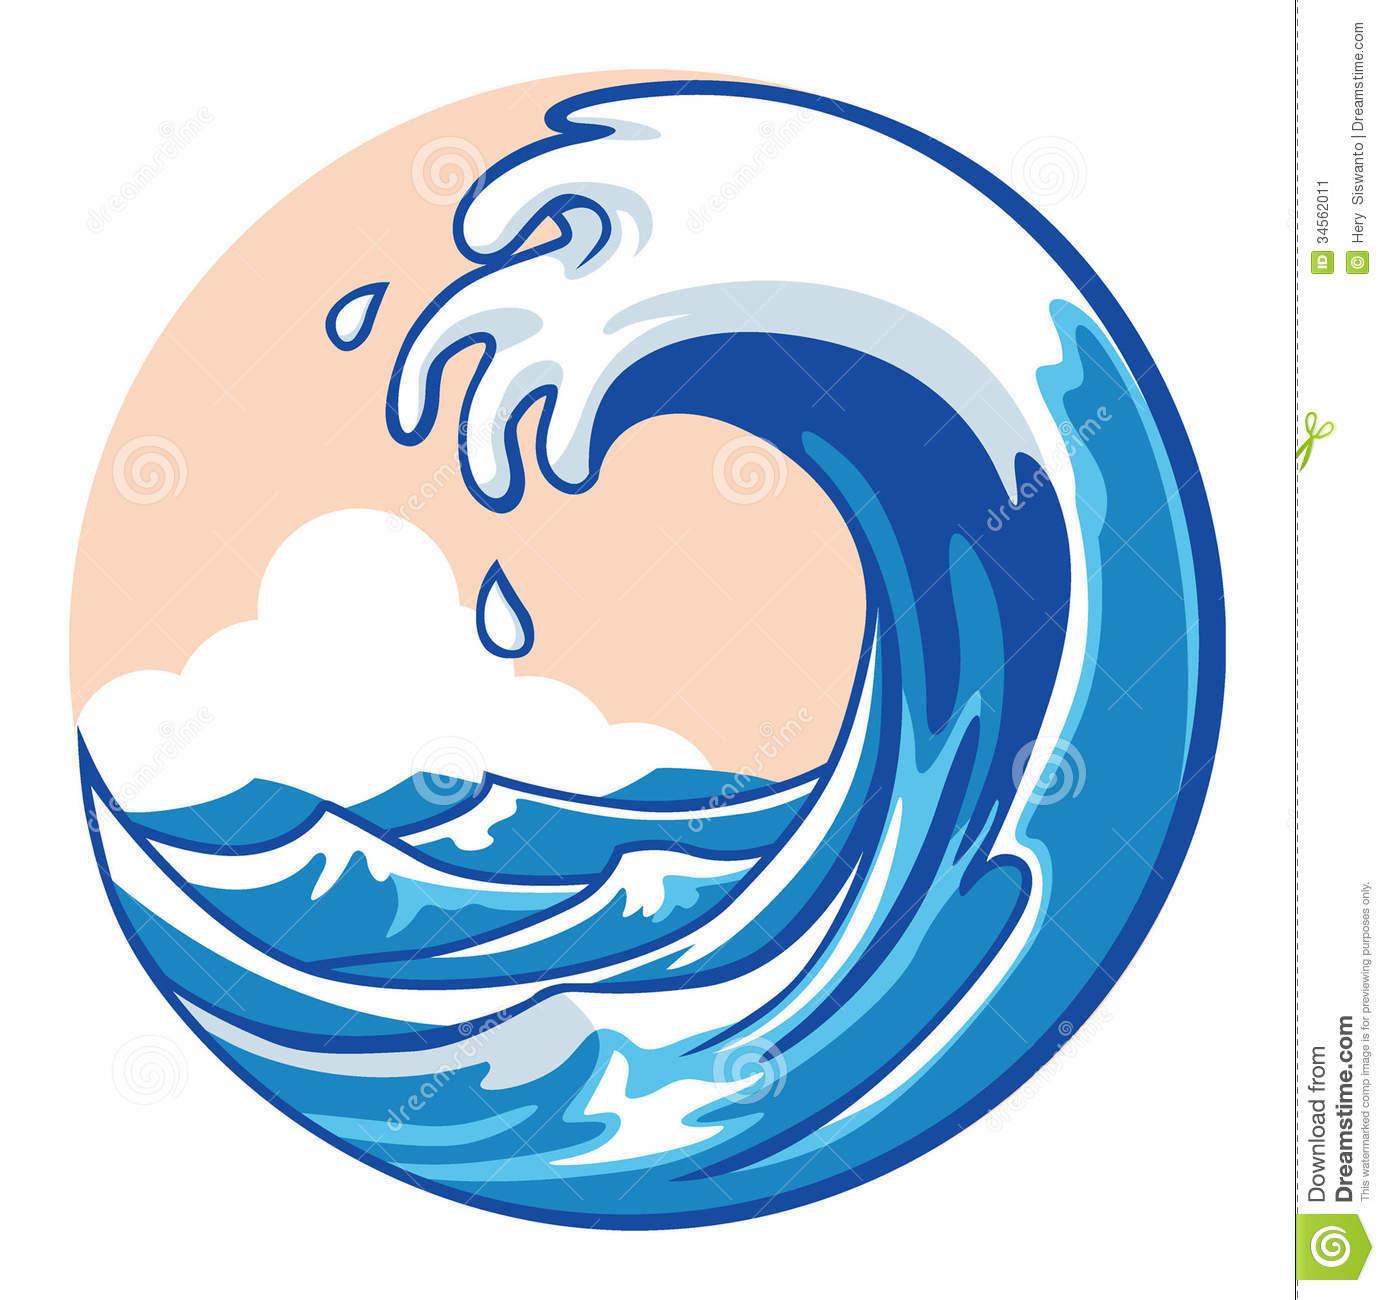 ocean wave clipart panda free clipart images rh clipartpanda com ocean wave clipart free ocean wave clipart